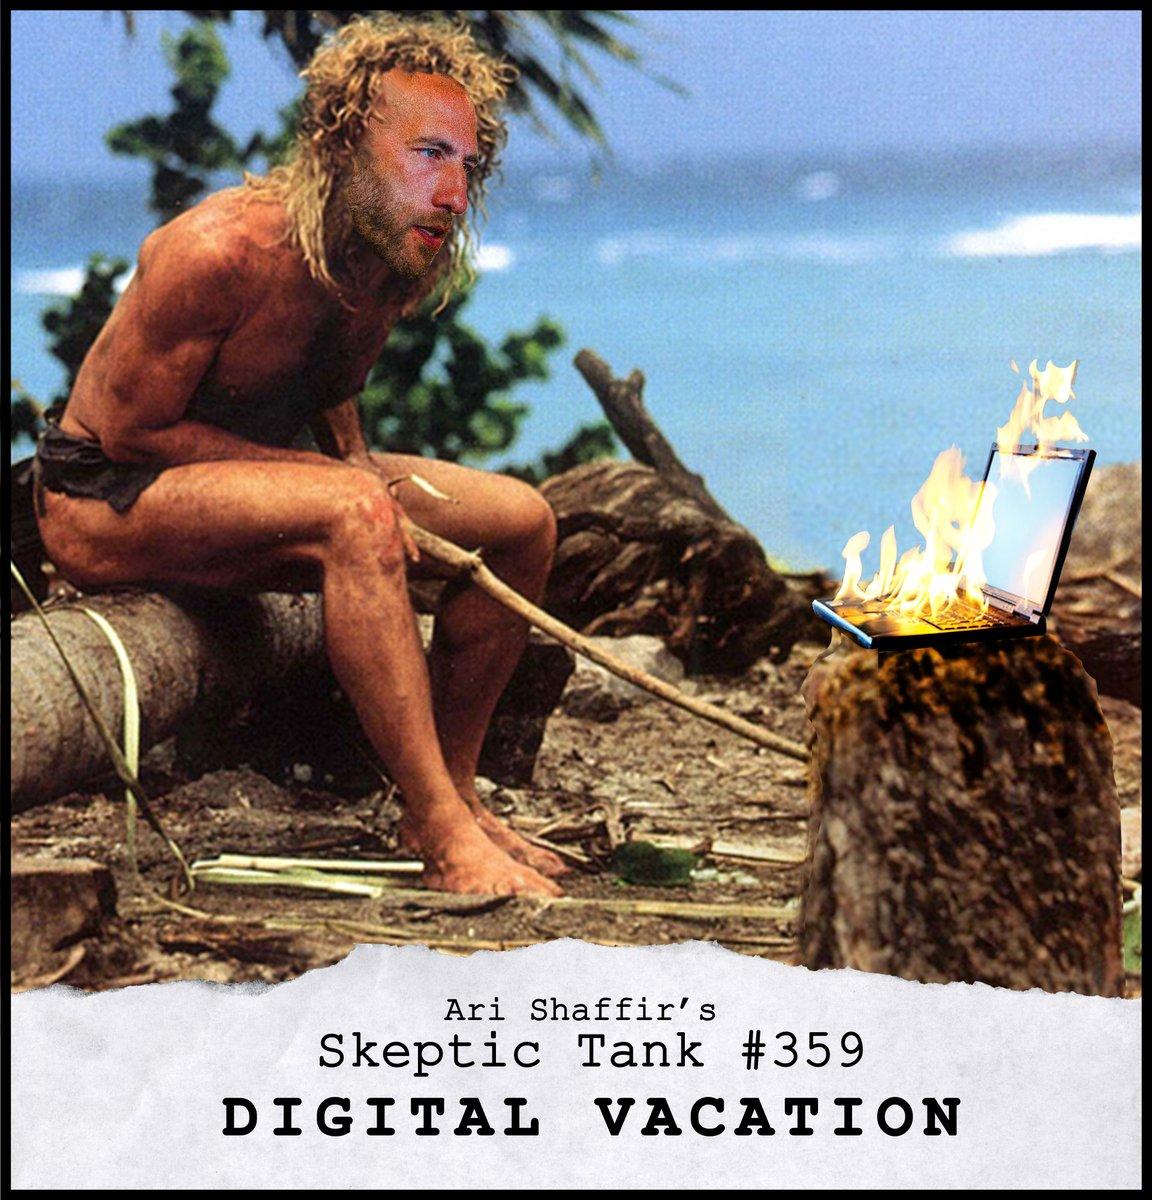 #359: Digital Vacation (@AriShaffir)